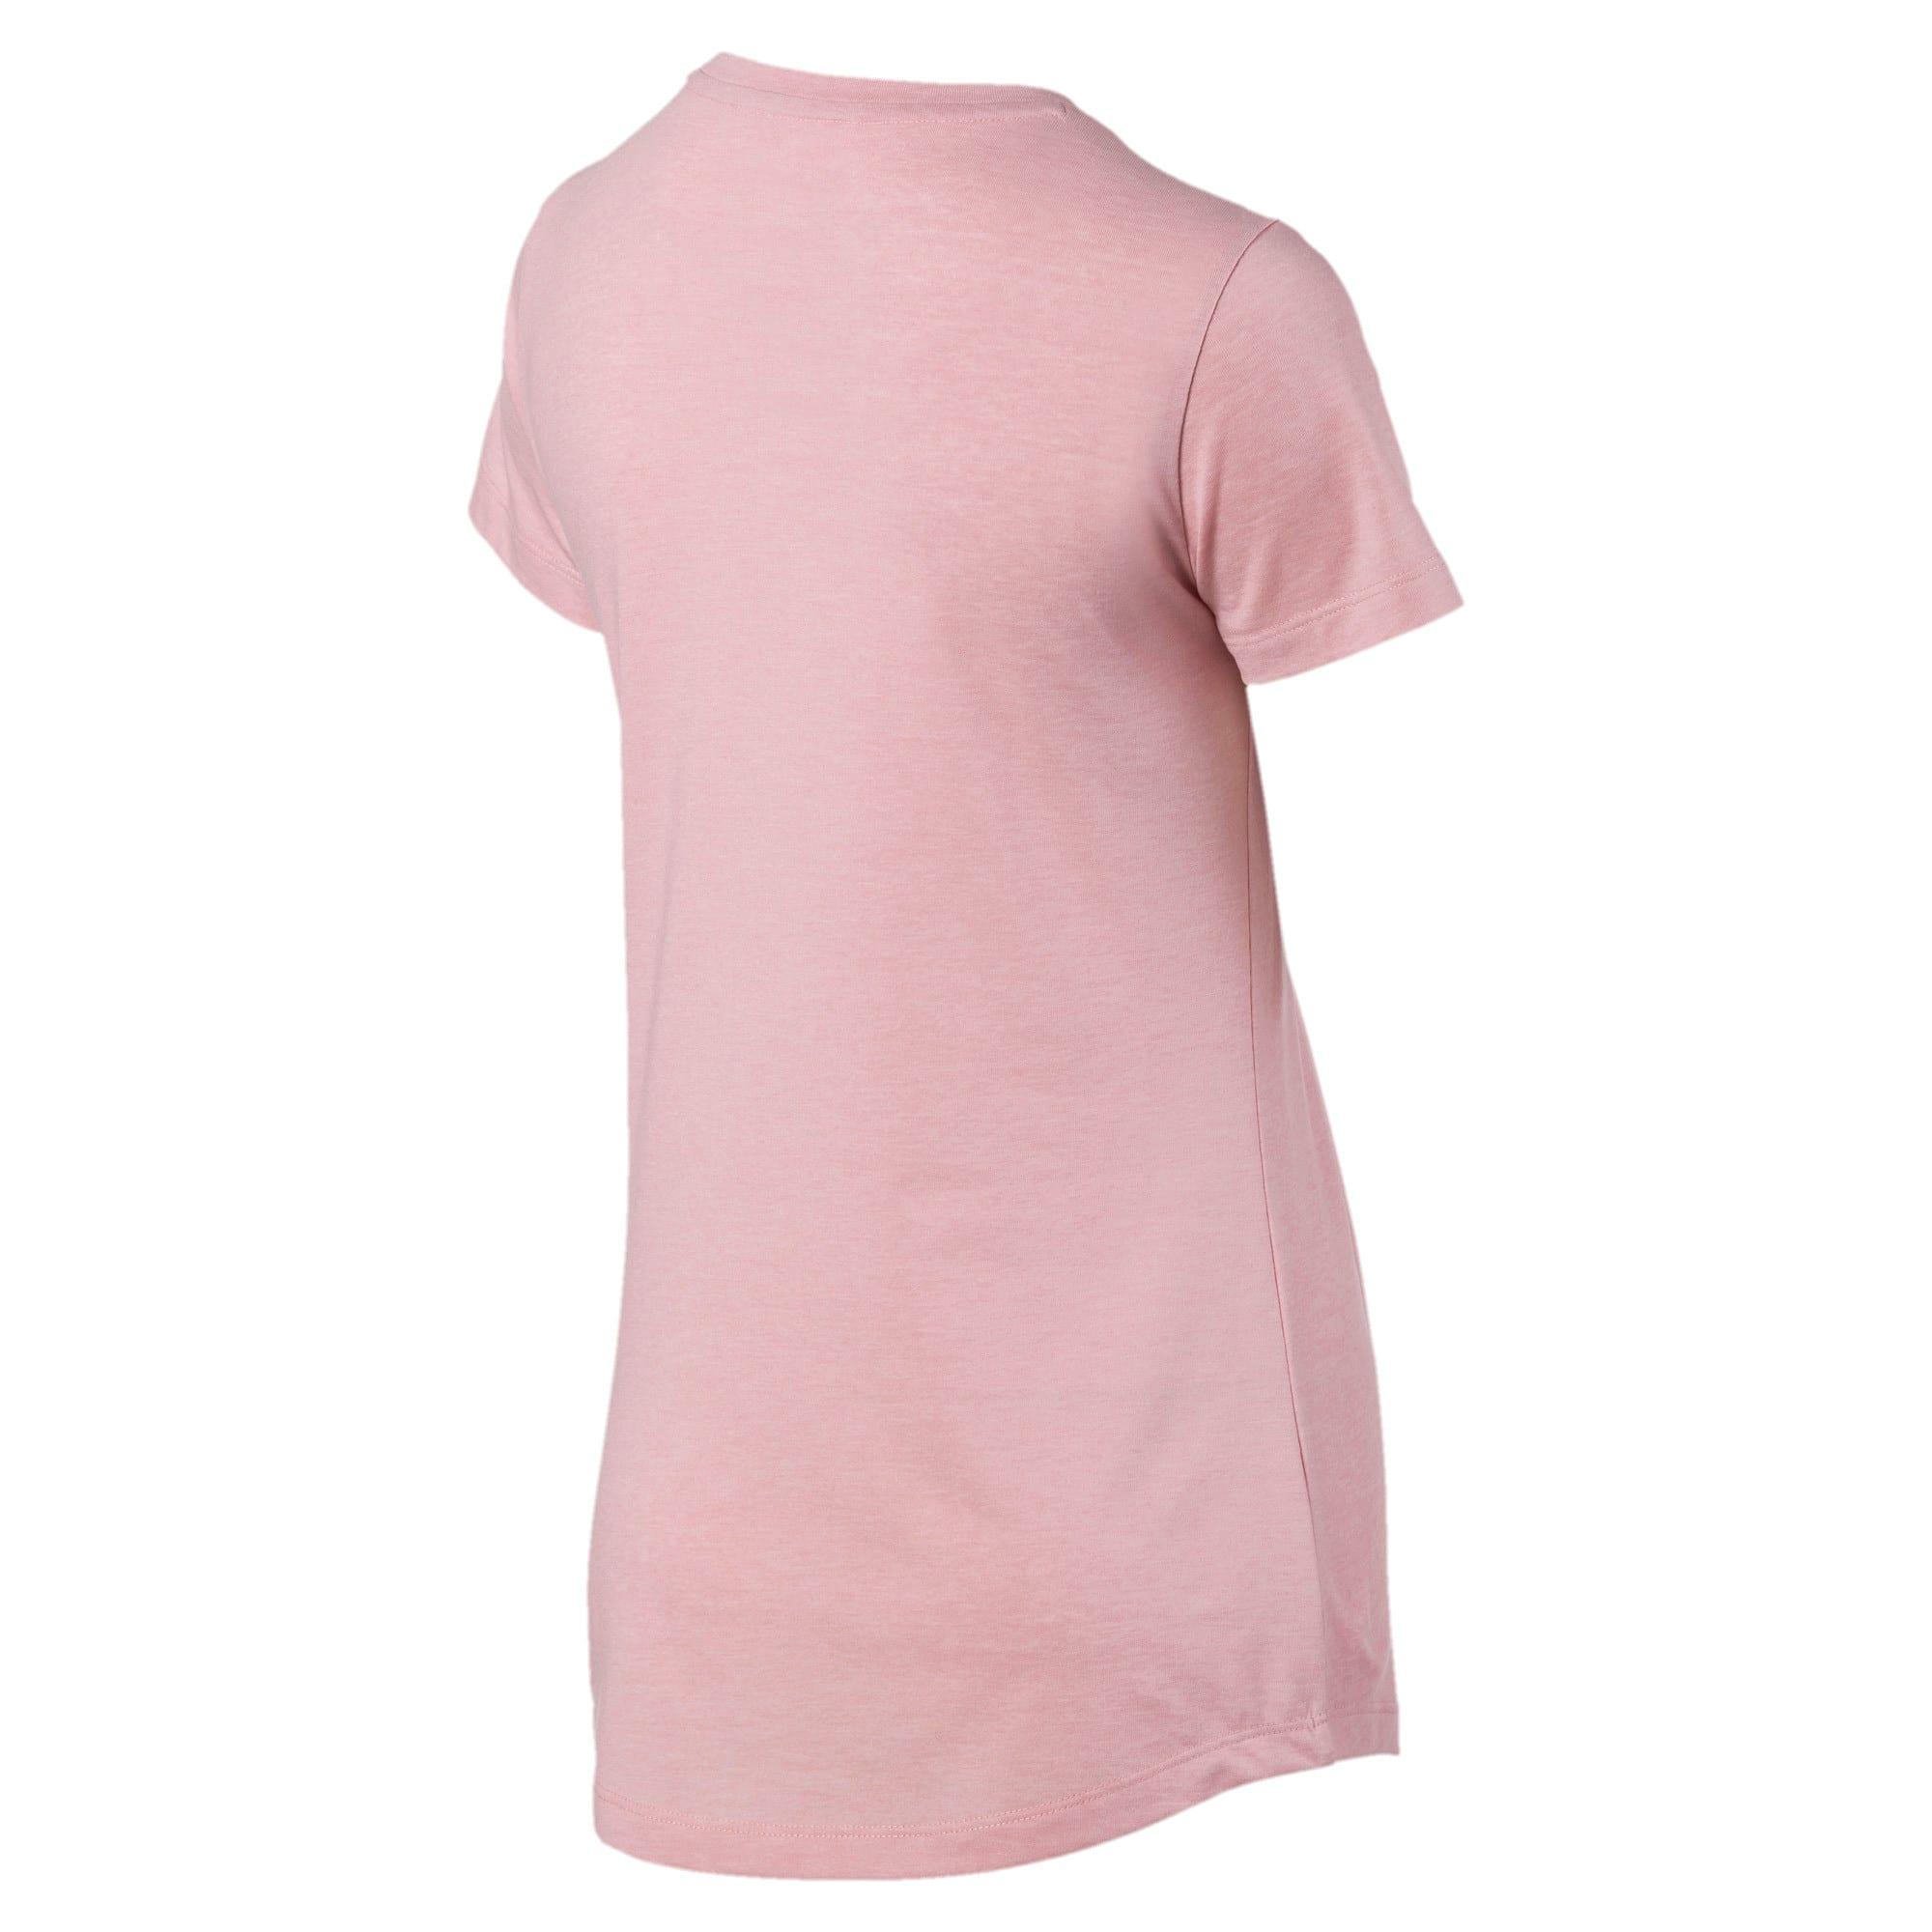 Thumbnail 5 of Essentials Heather Damen T-Shirt, Bridal Rose, medium